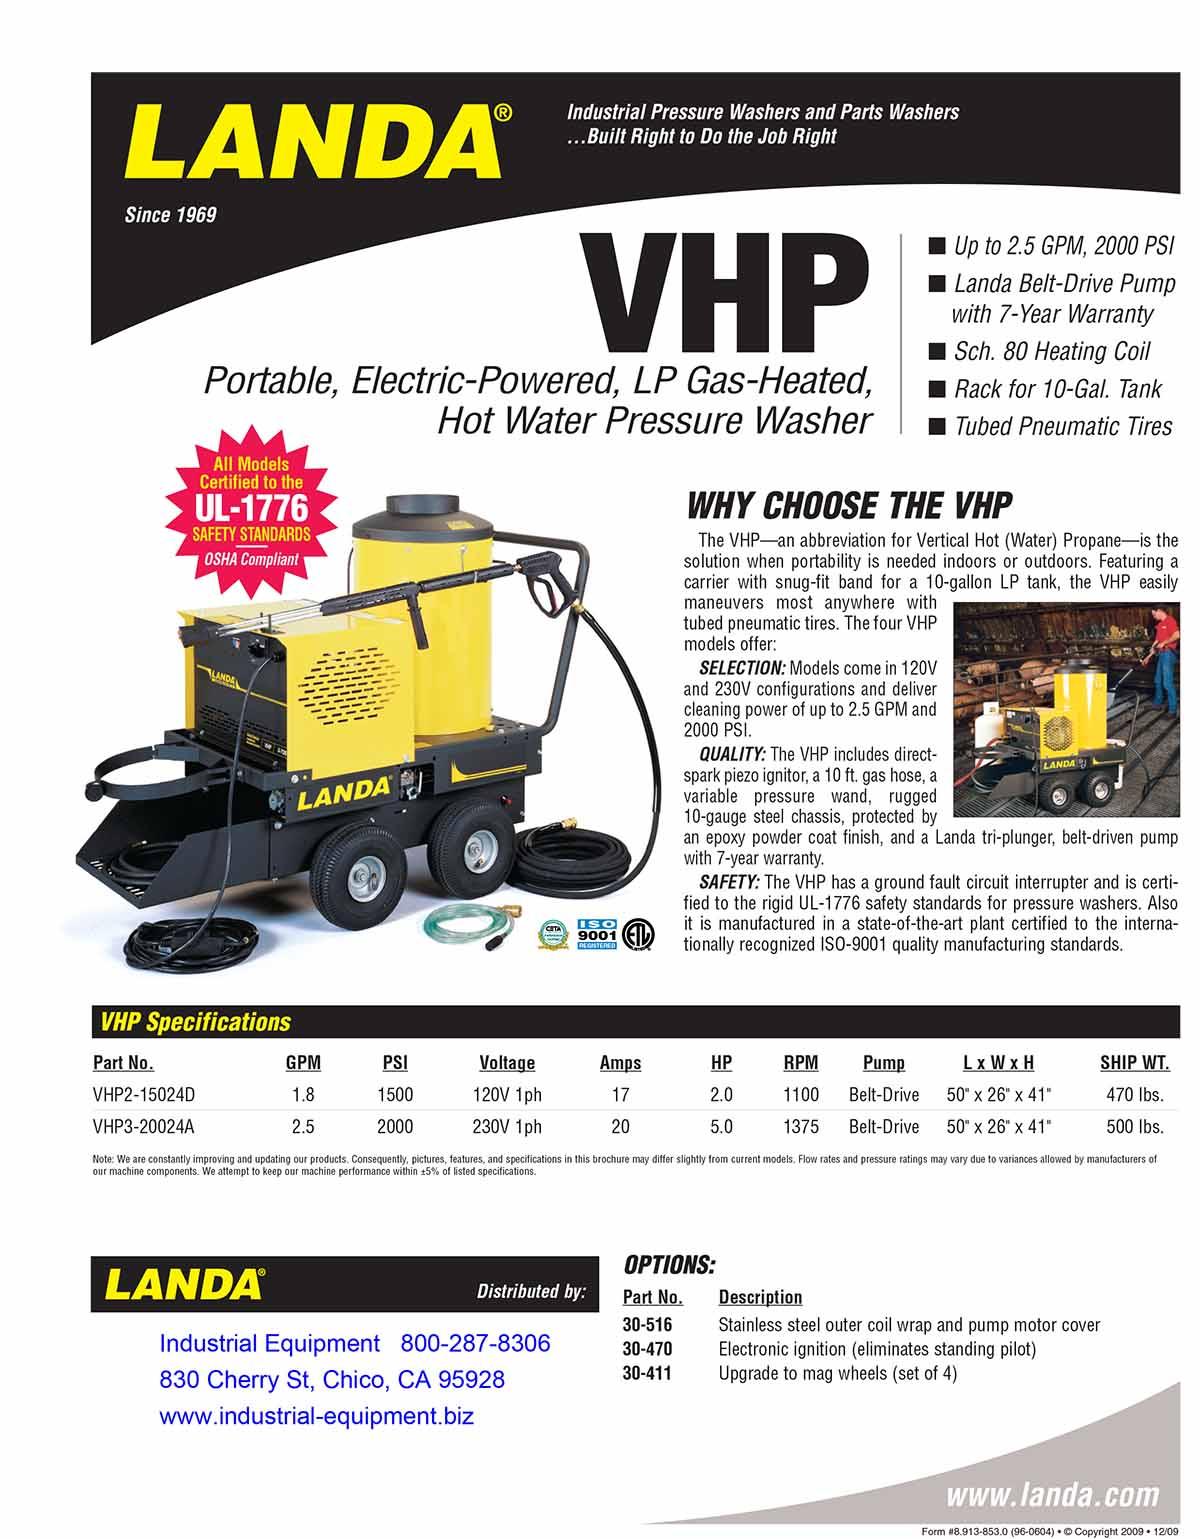 LANDA VHP Equipment Flyer